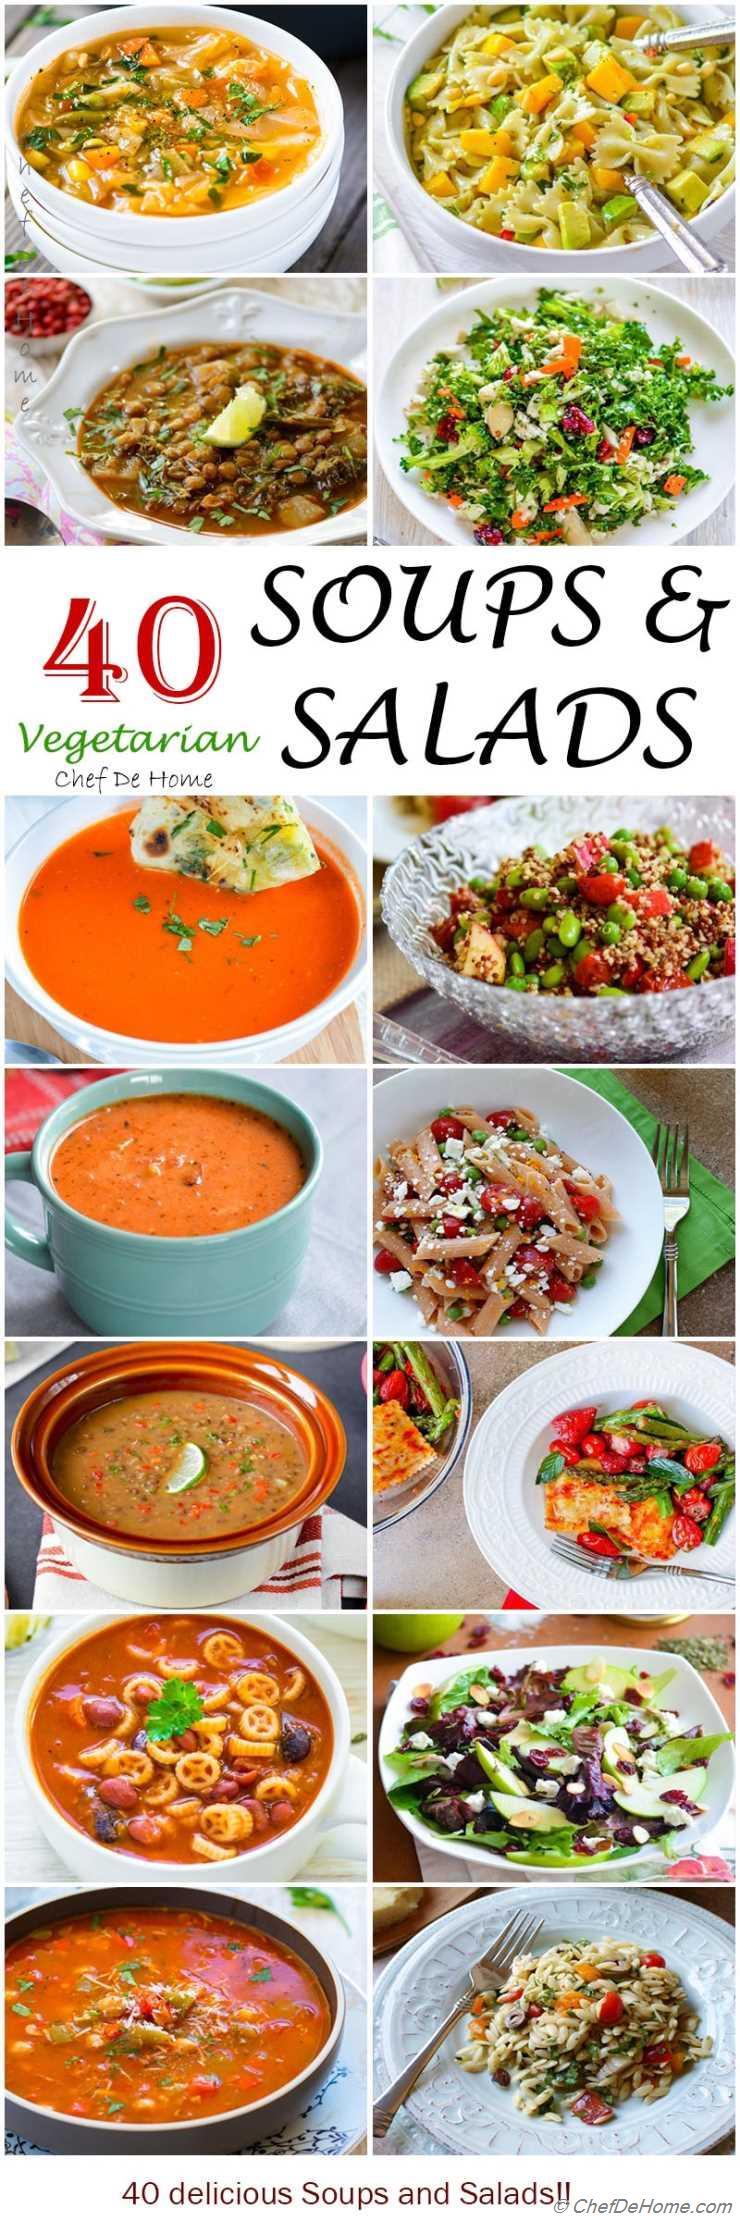 40 Vegetarian Soup and Salad Recipes